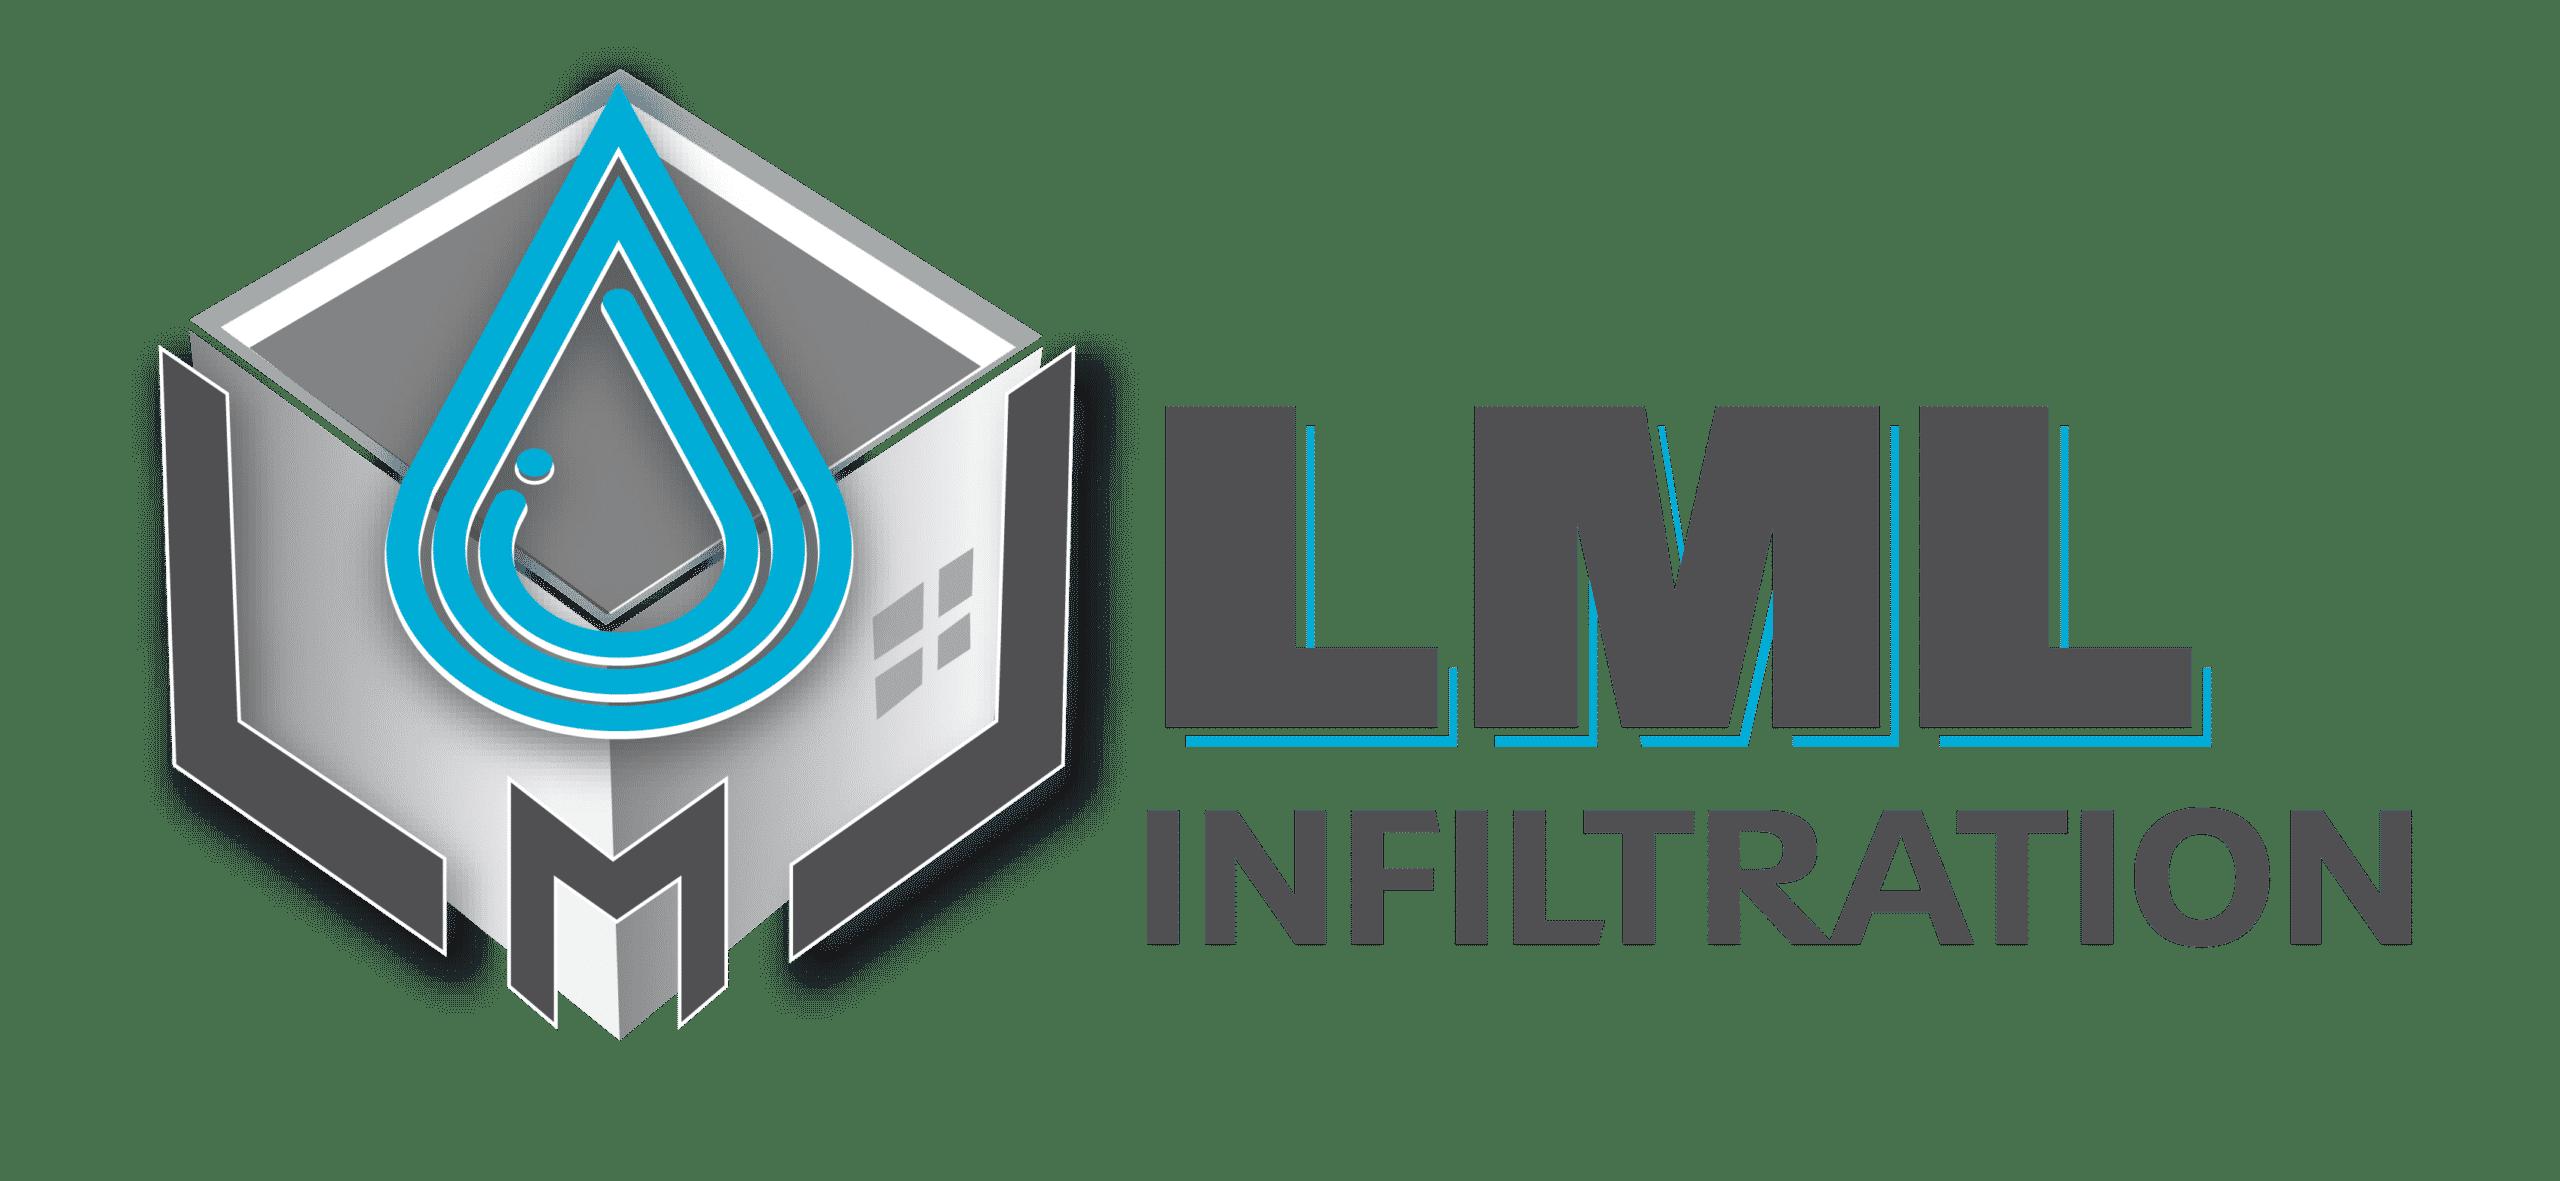 logo-lml-infiltration